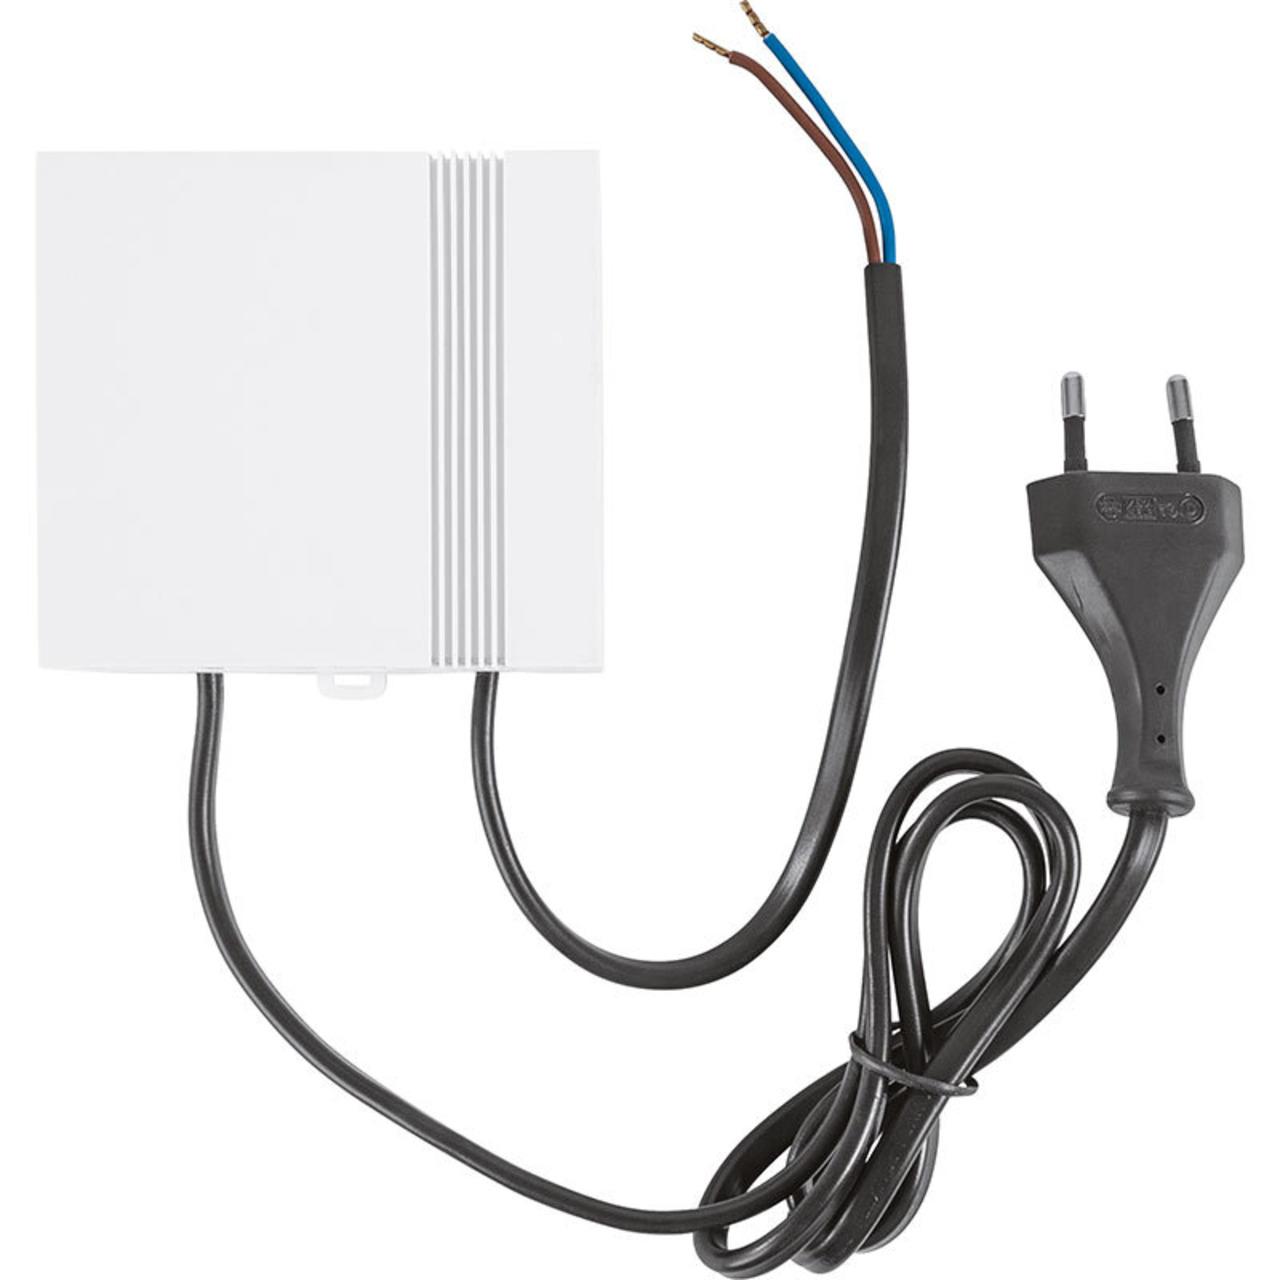 Homematic IP Smart Home Trafo HmIP-FAL24-TR für Fussbodenheizungsaktoren - 24V